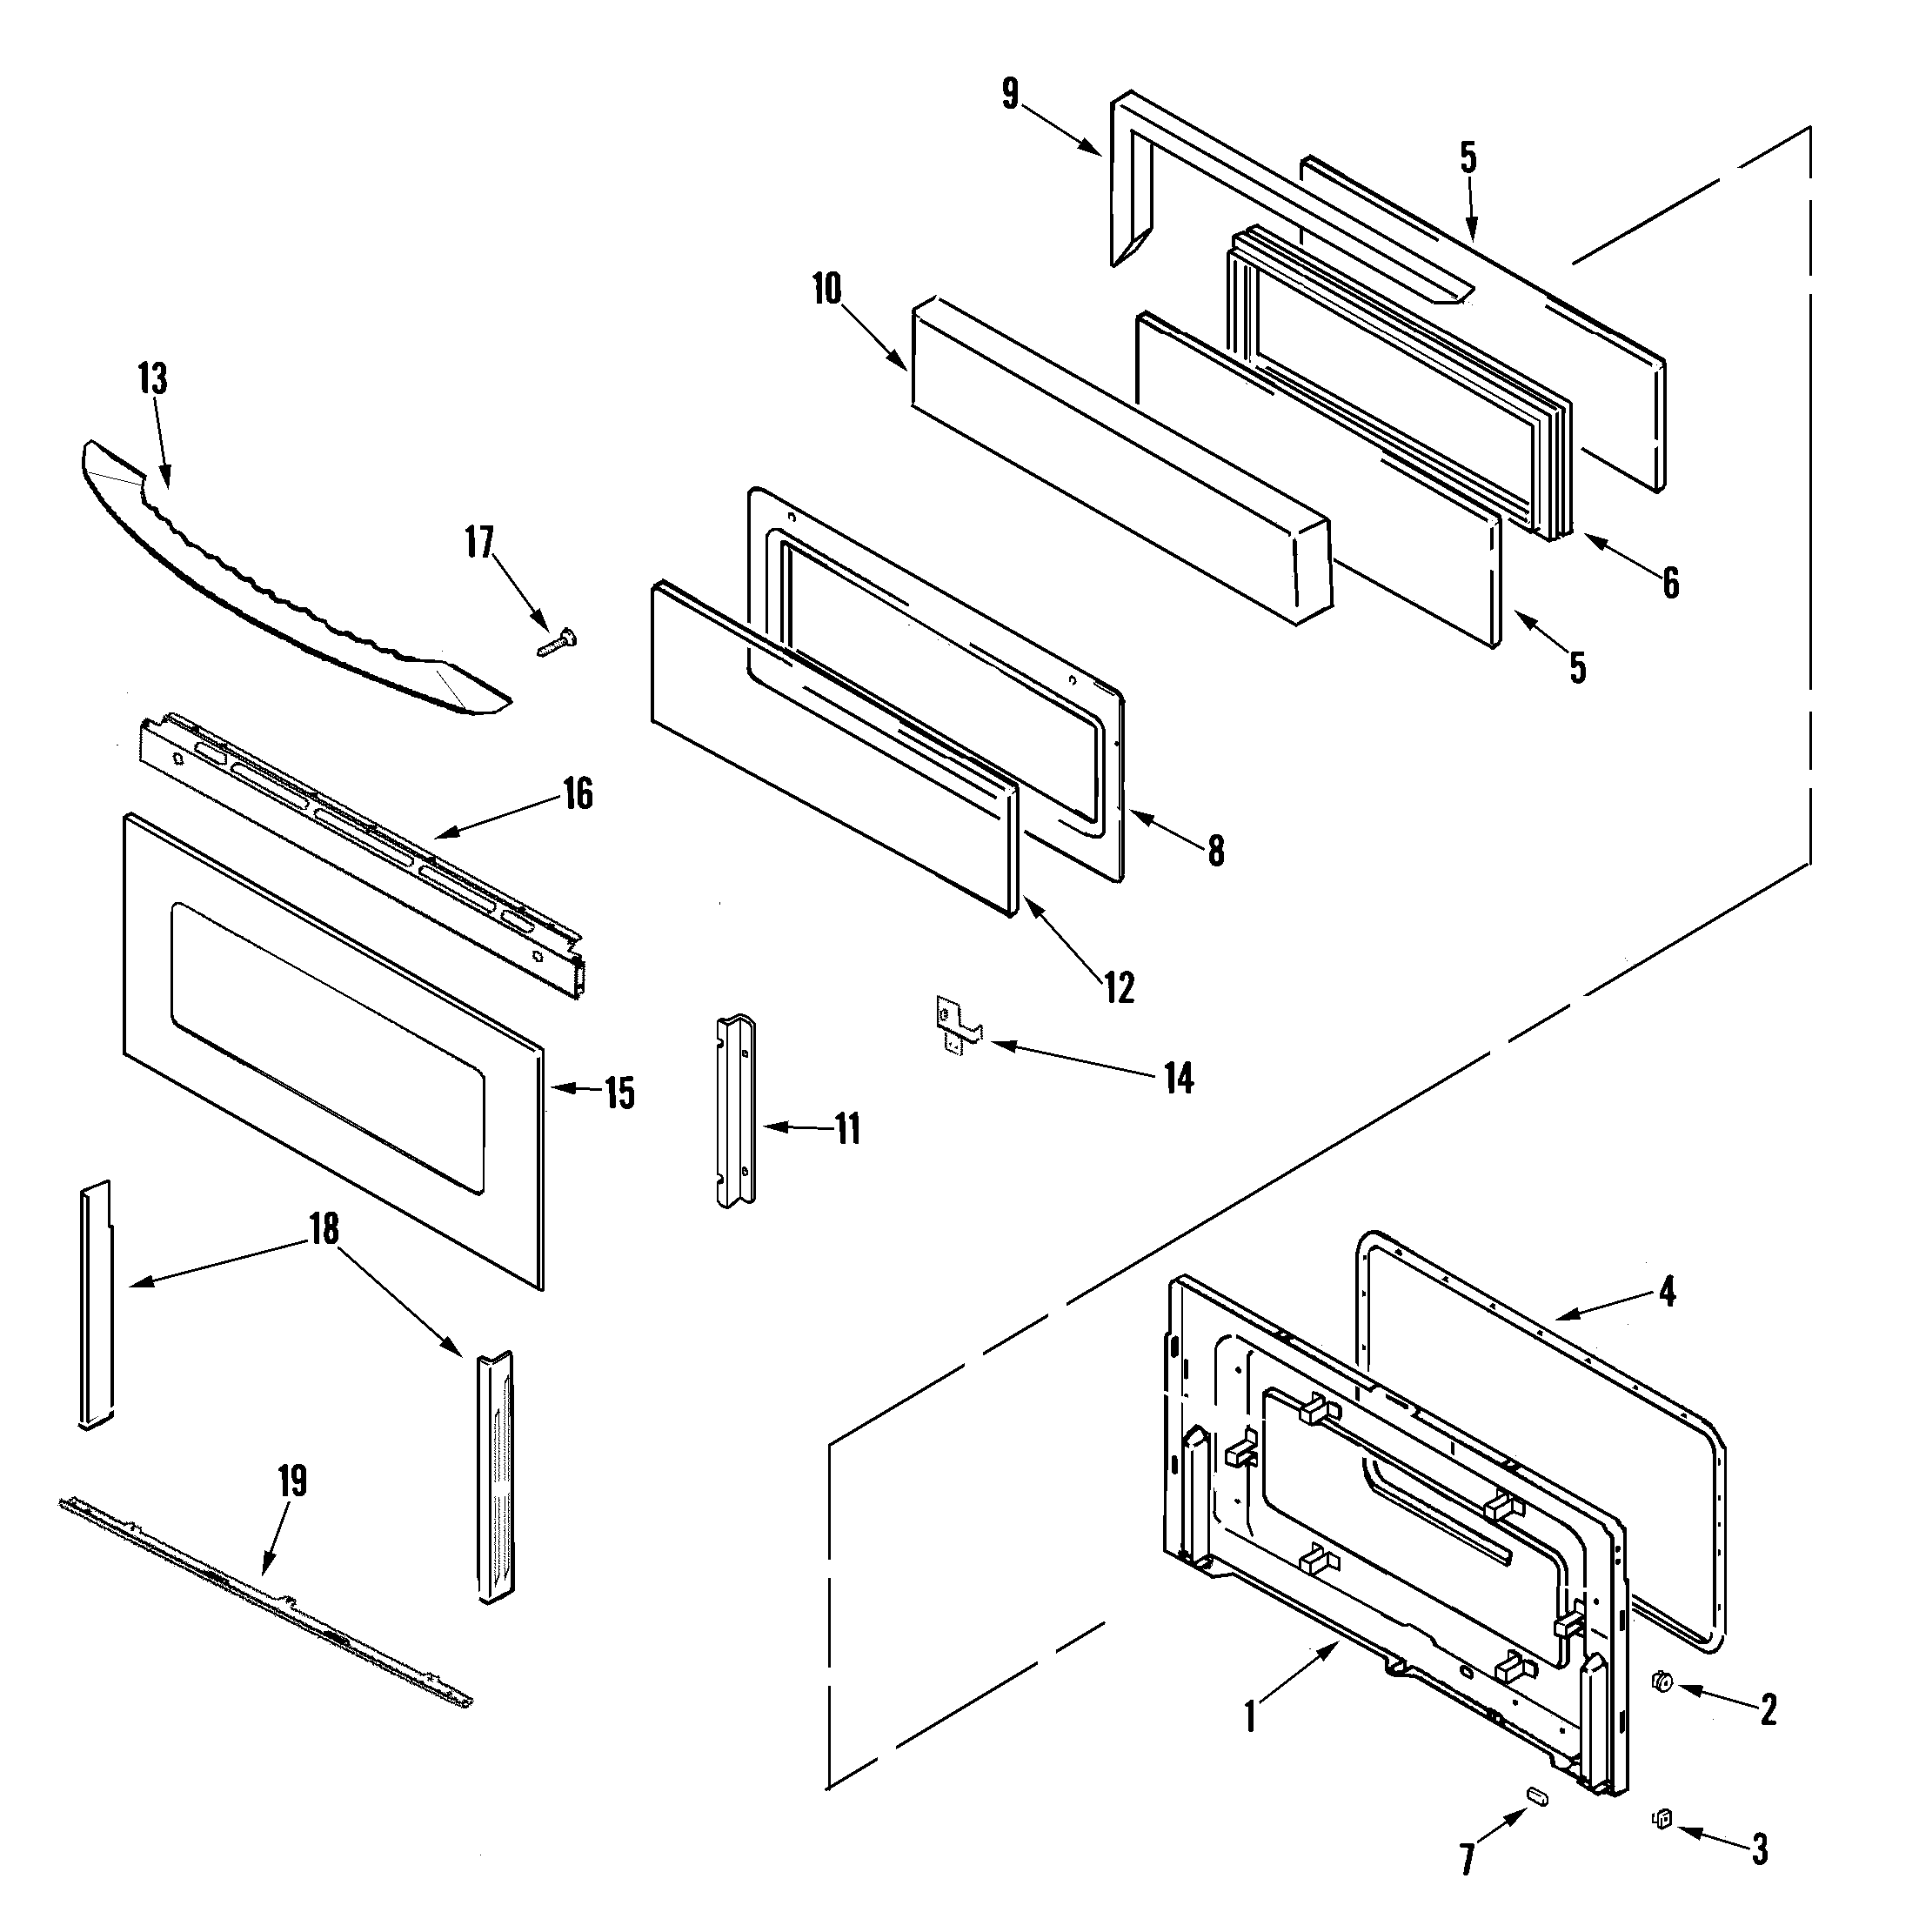 Simple Wiring Helplennox13acxwiringdiagrampng